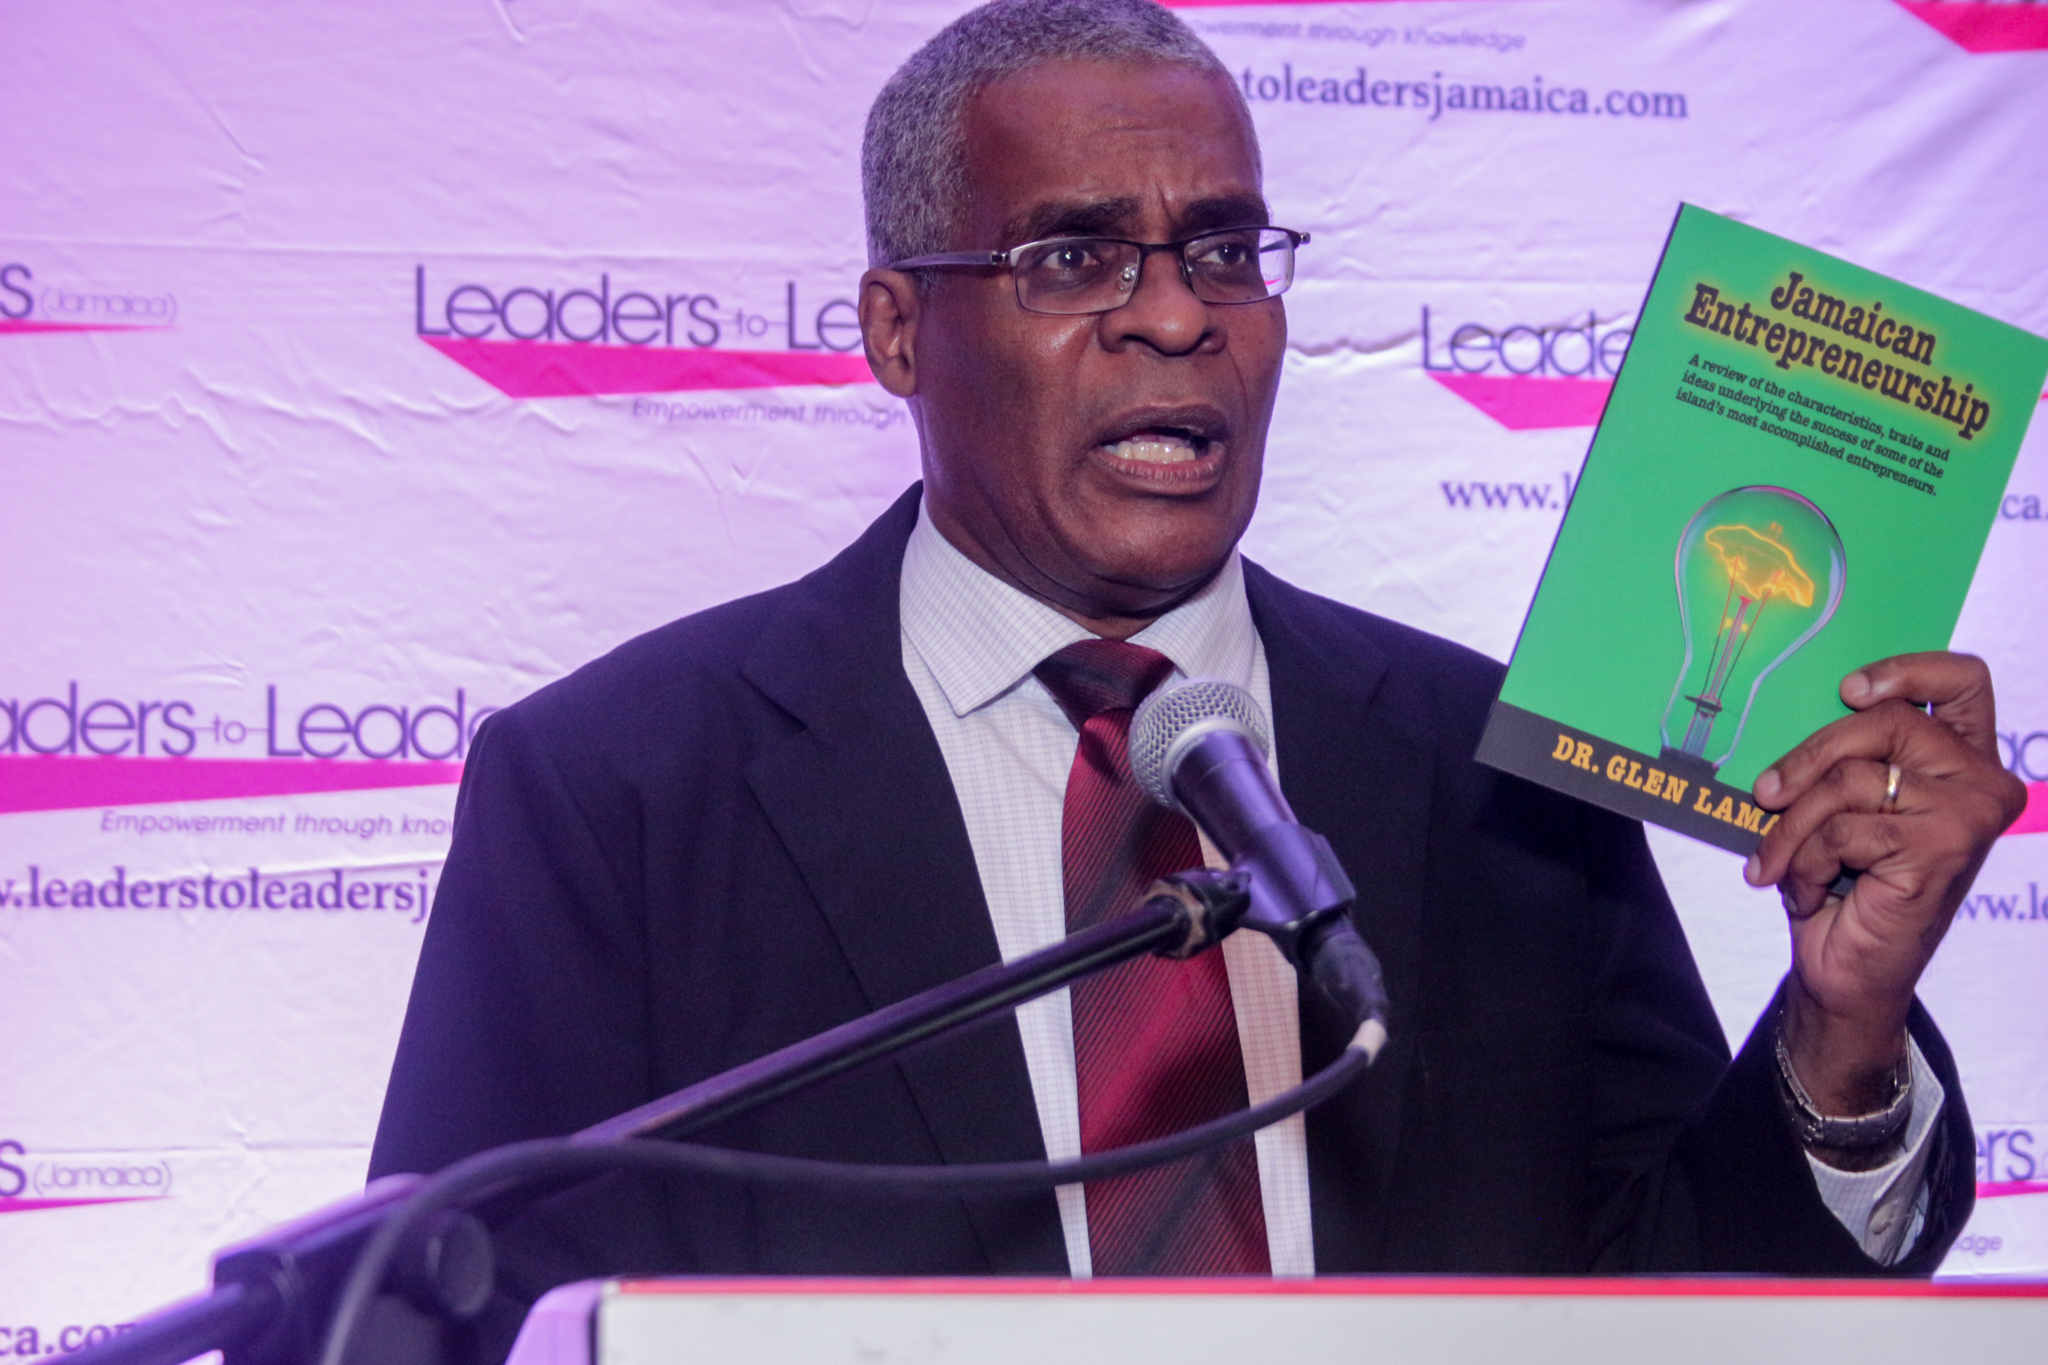 Jamaican Entrepreneurship Glen Laman 9789769569317